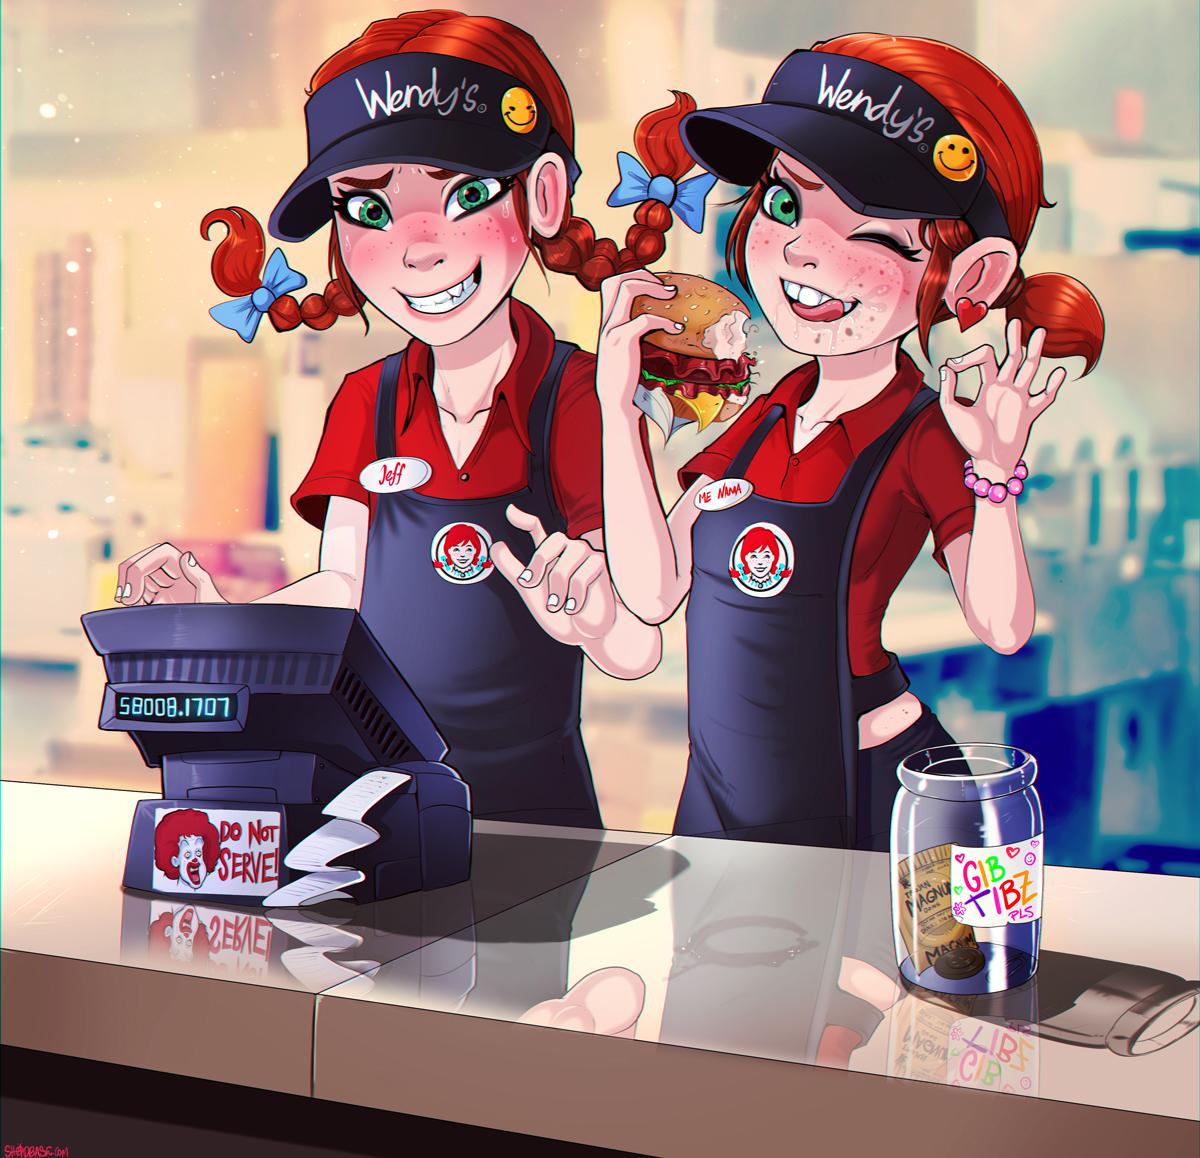 Smol Wendy's Employees